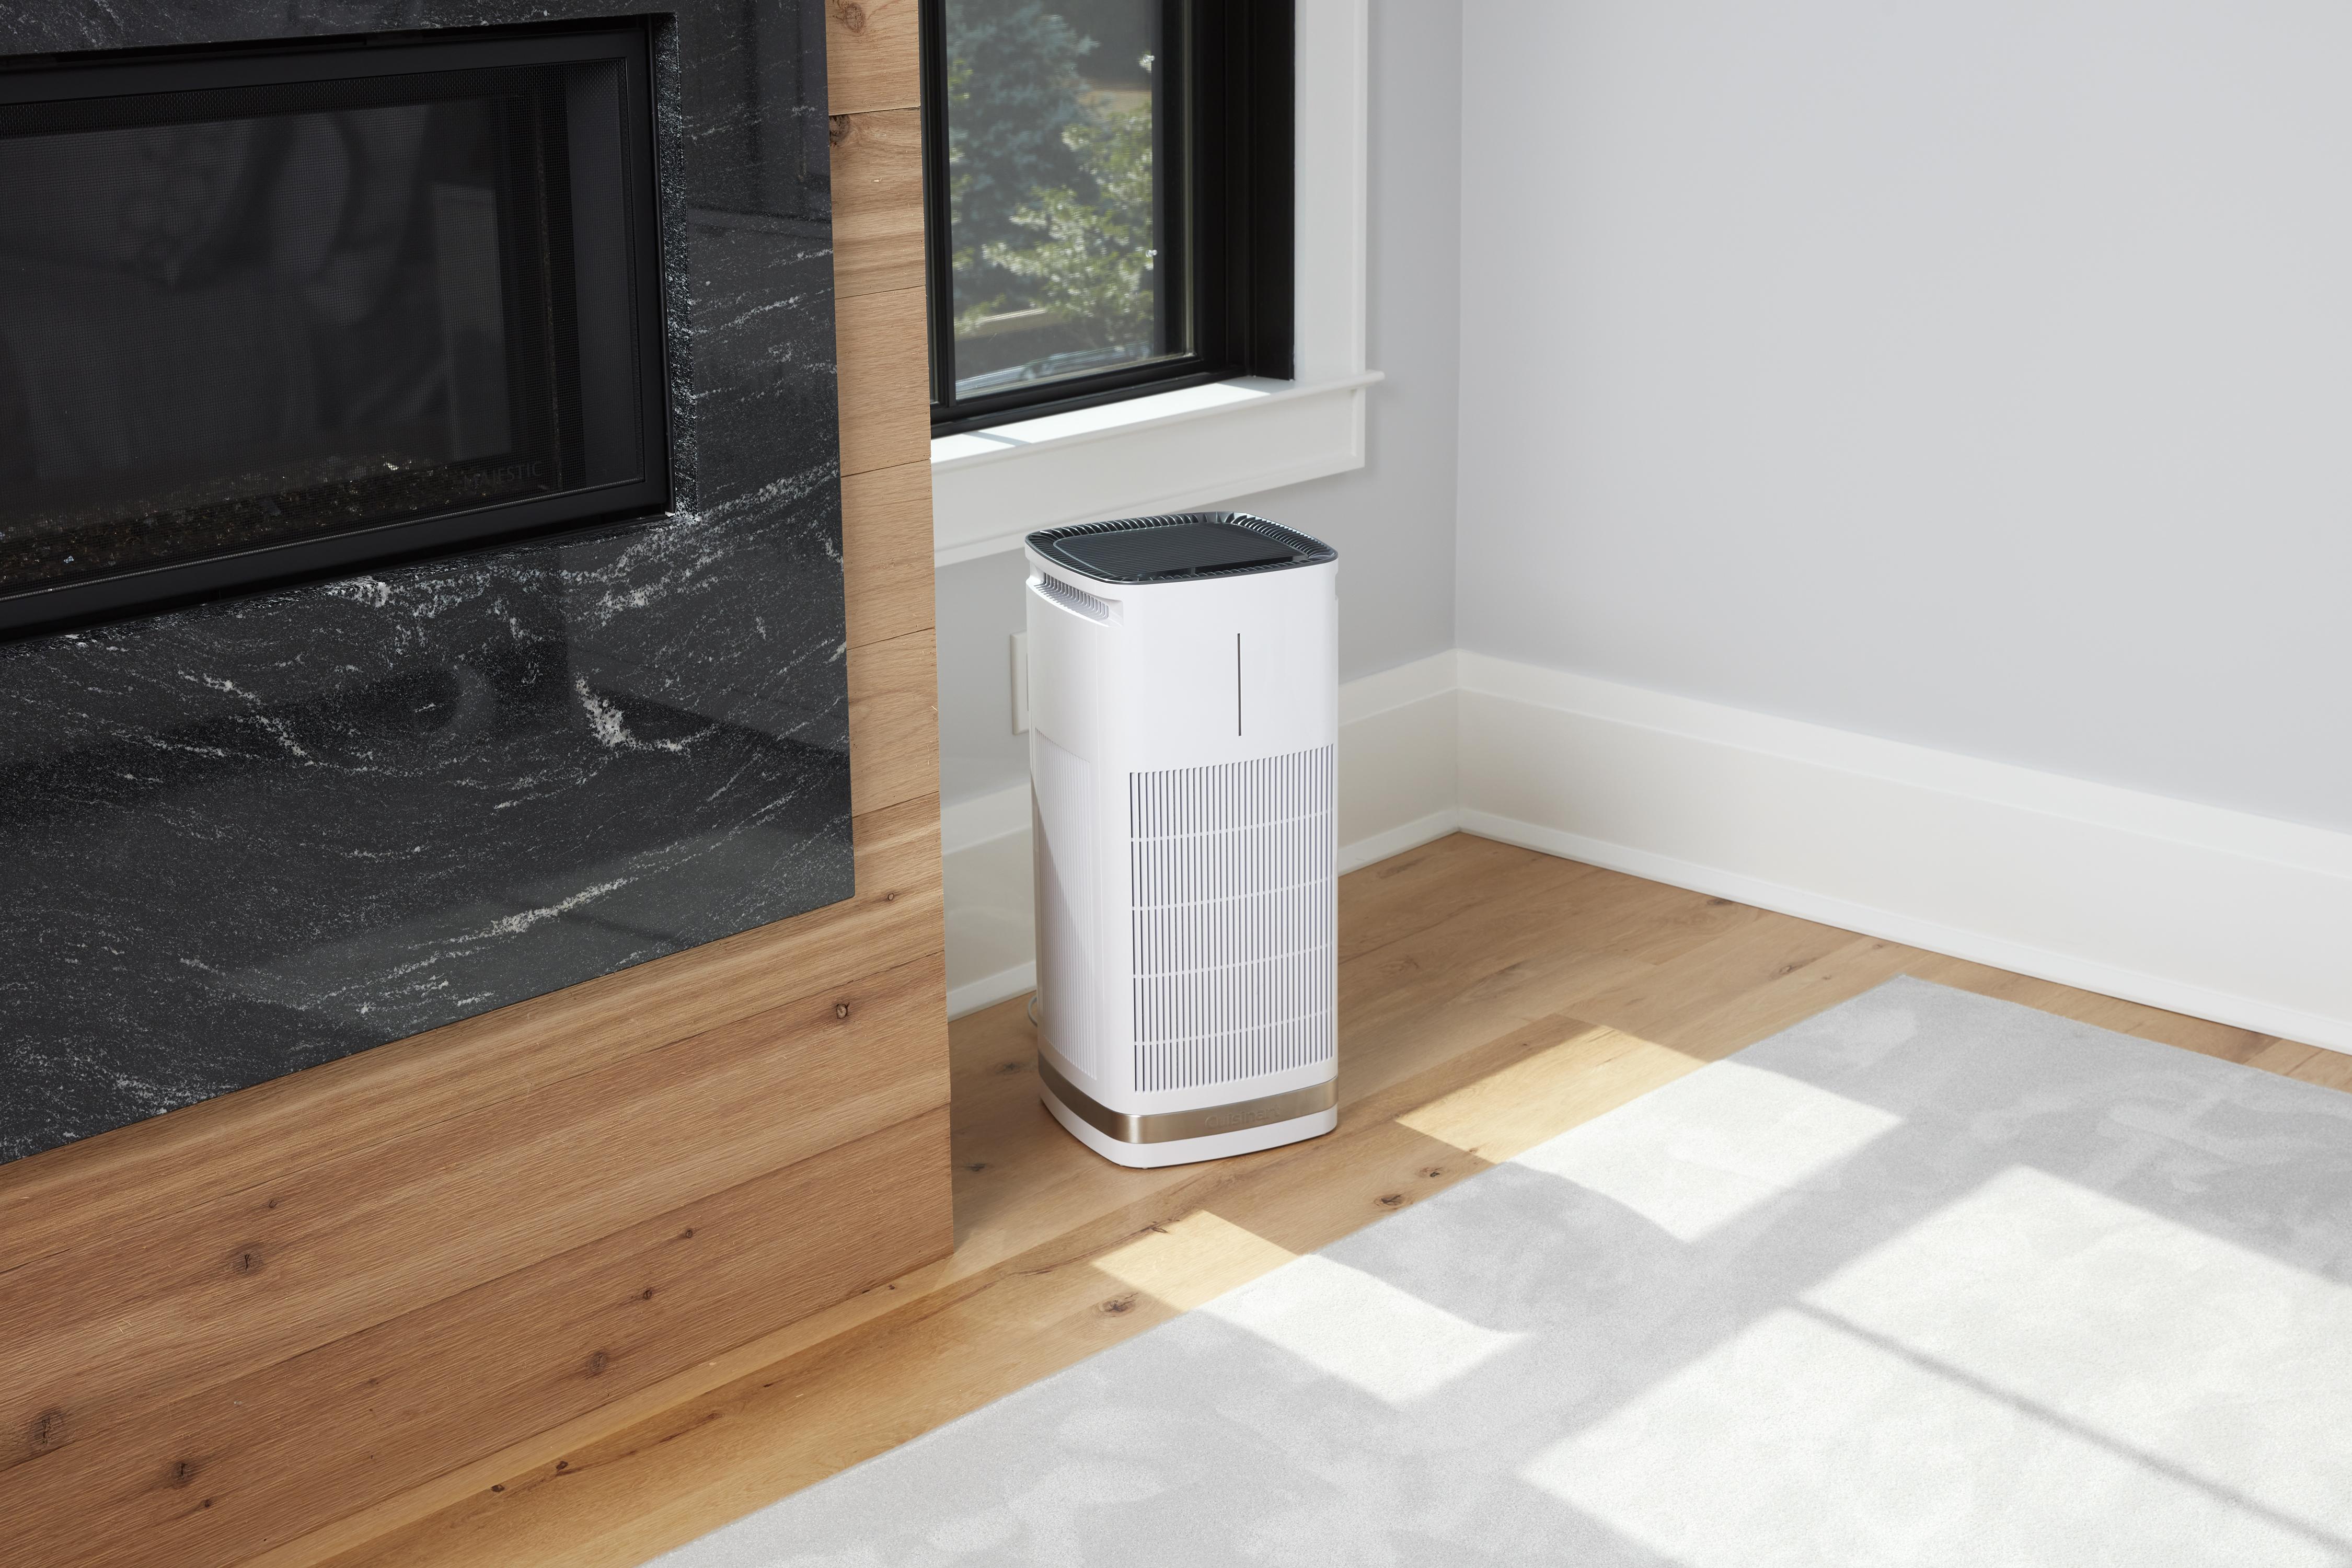 PuRXium Large Room/Freestanding Air Purifier